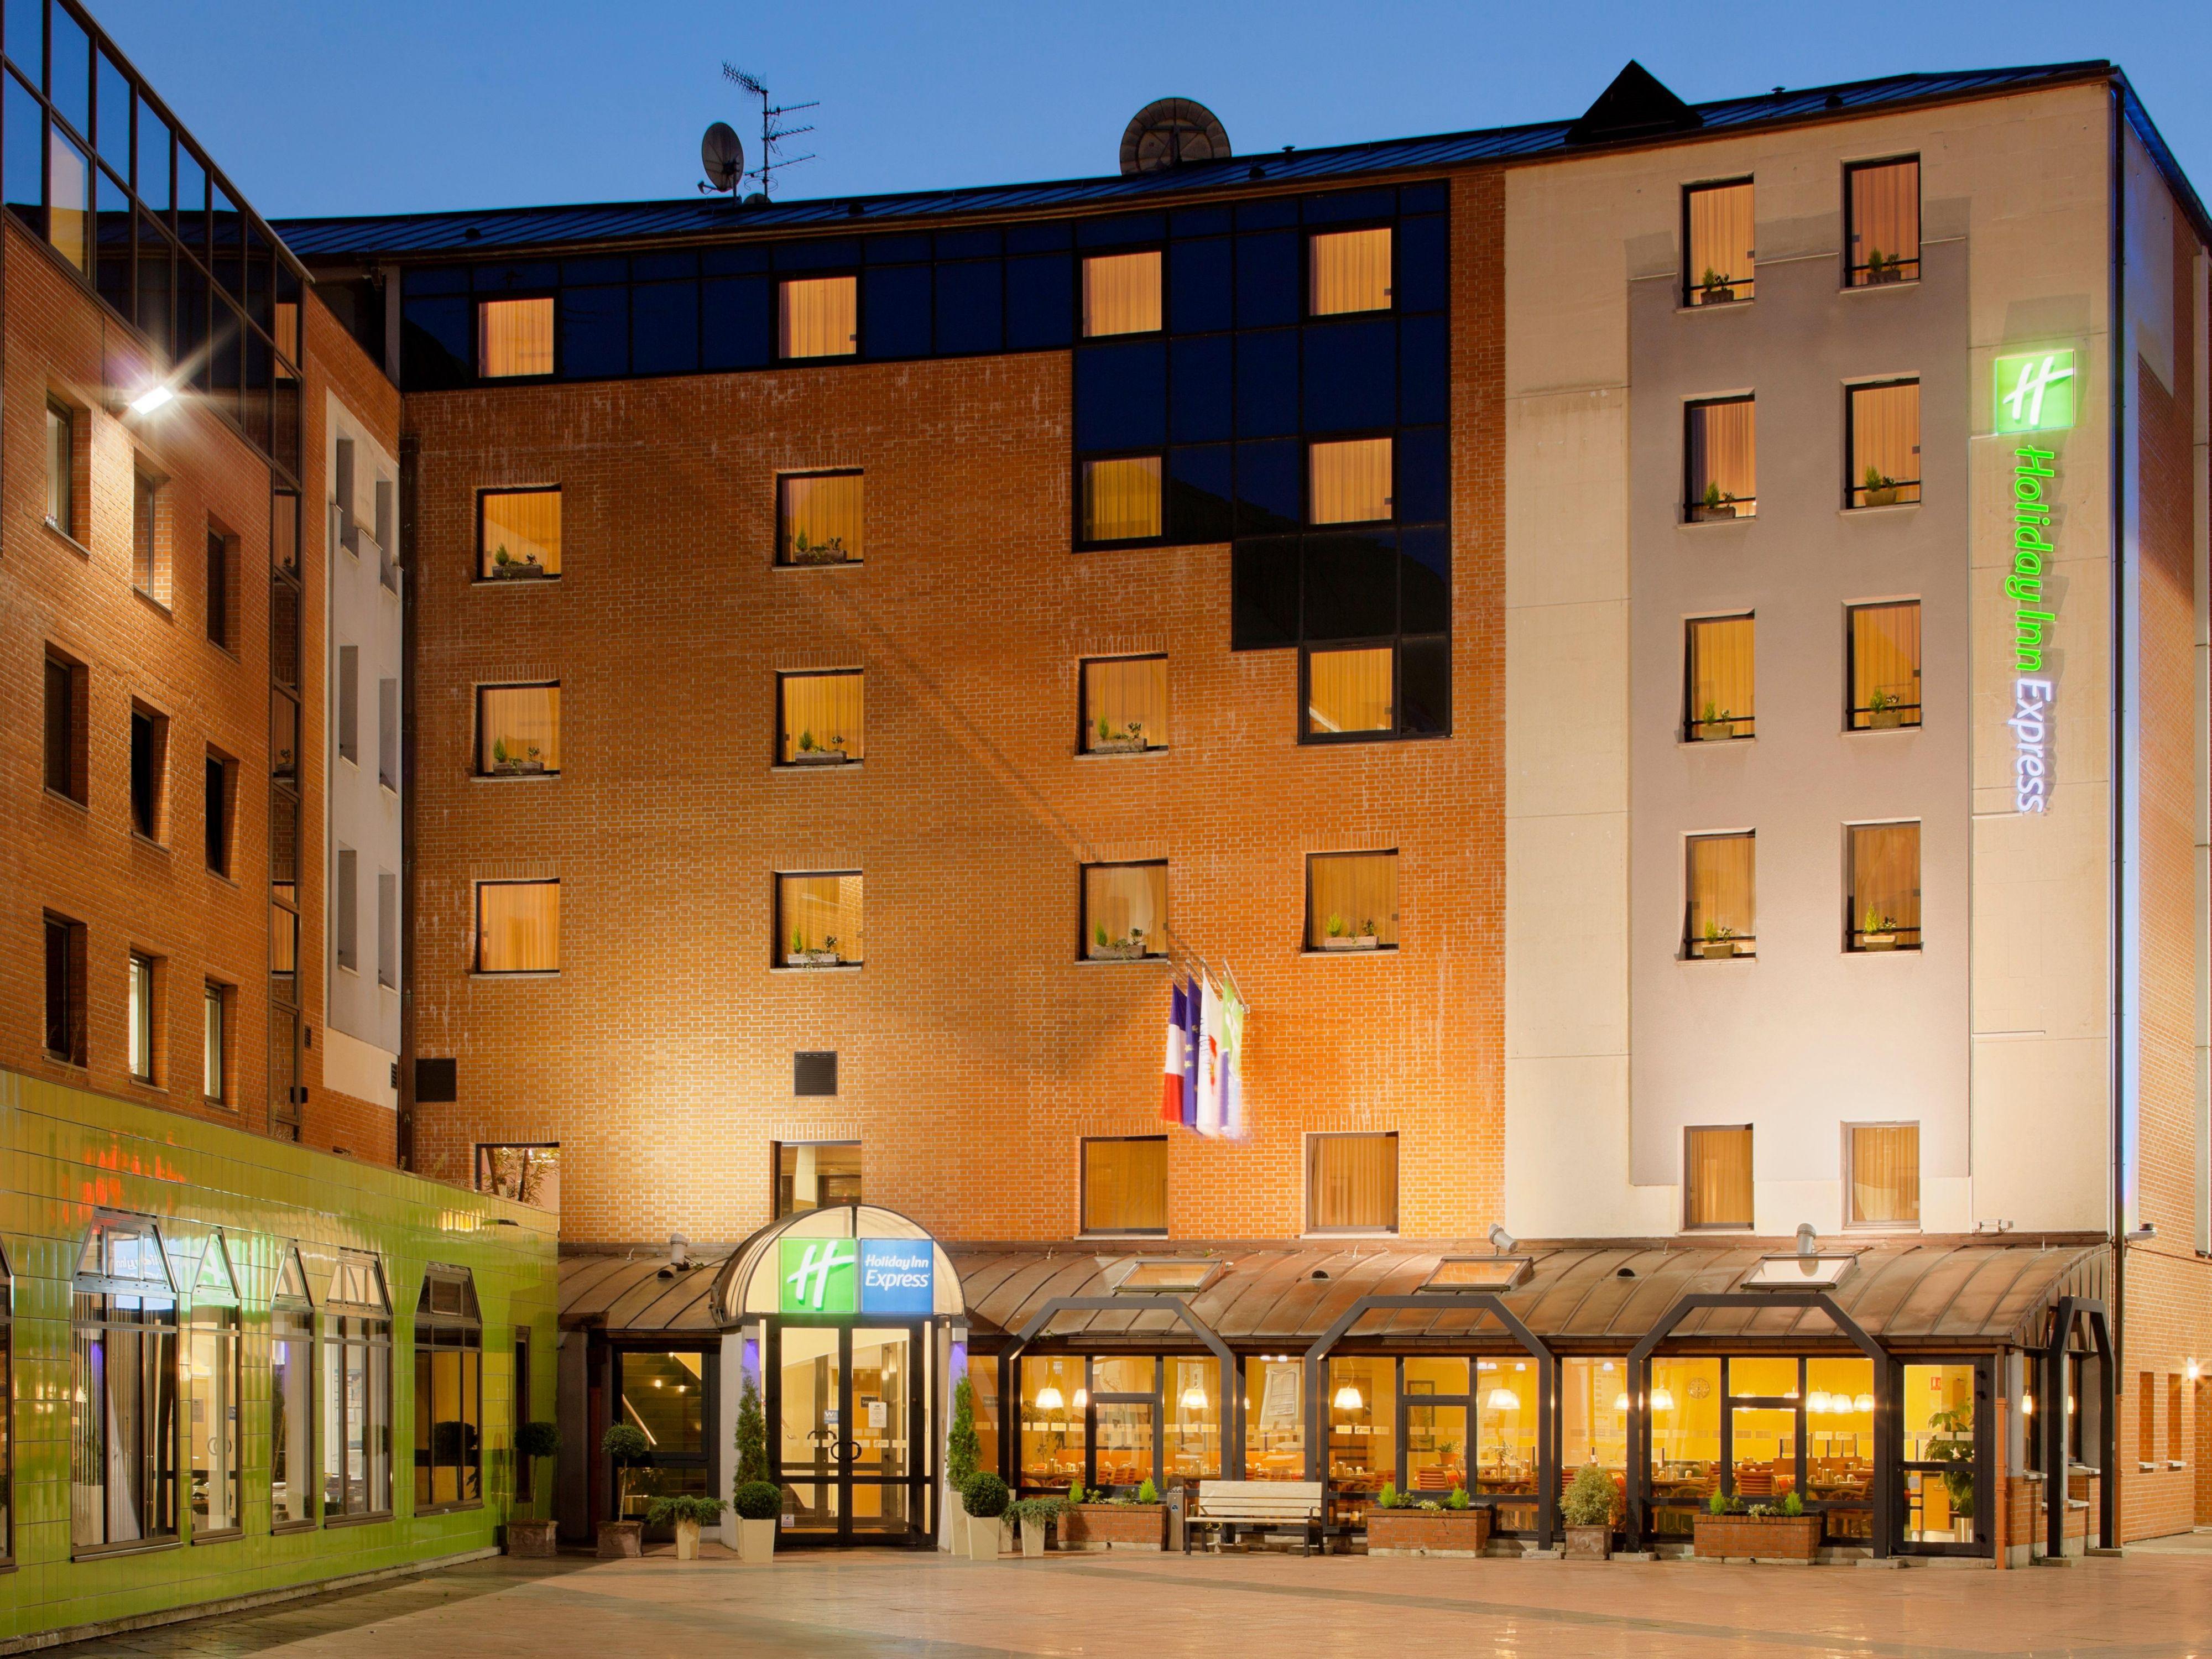 Holiday inn express arras hôtel ihg